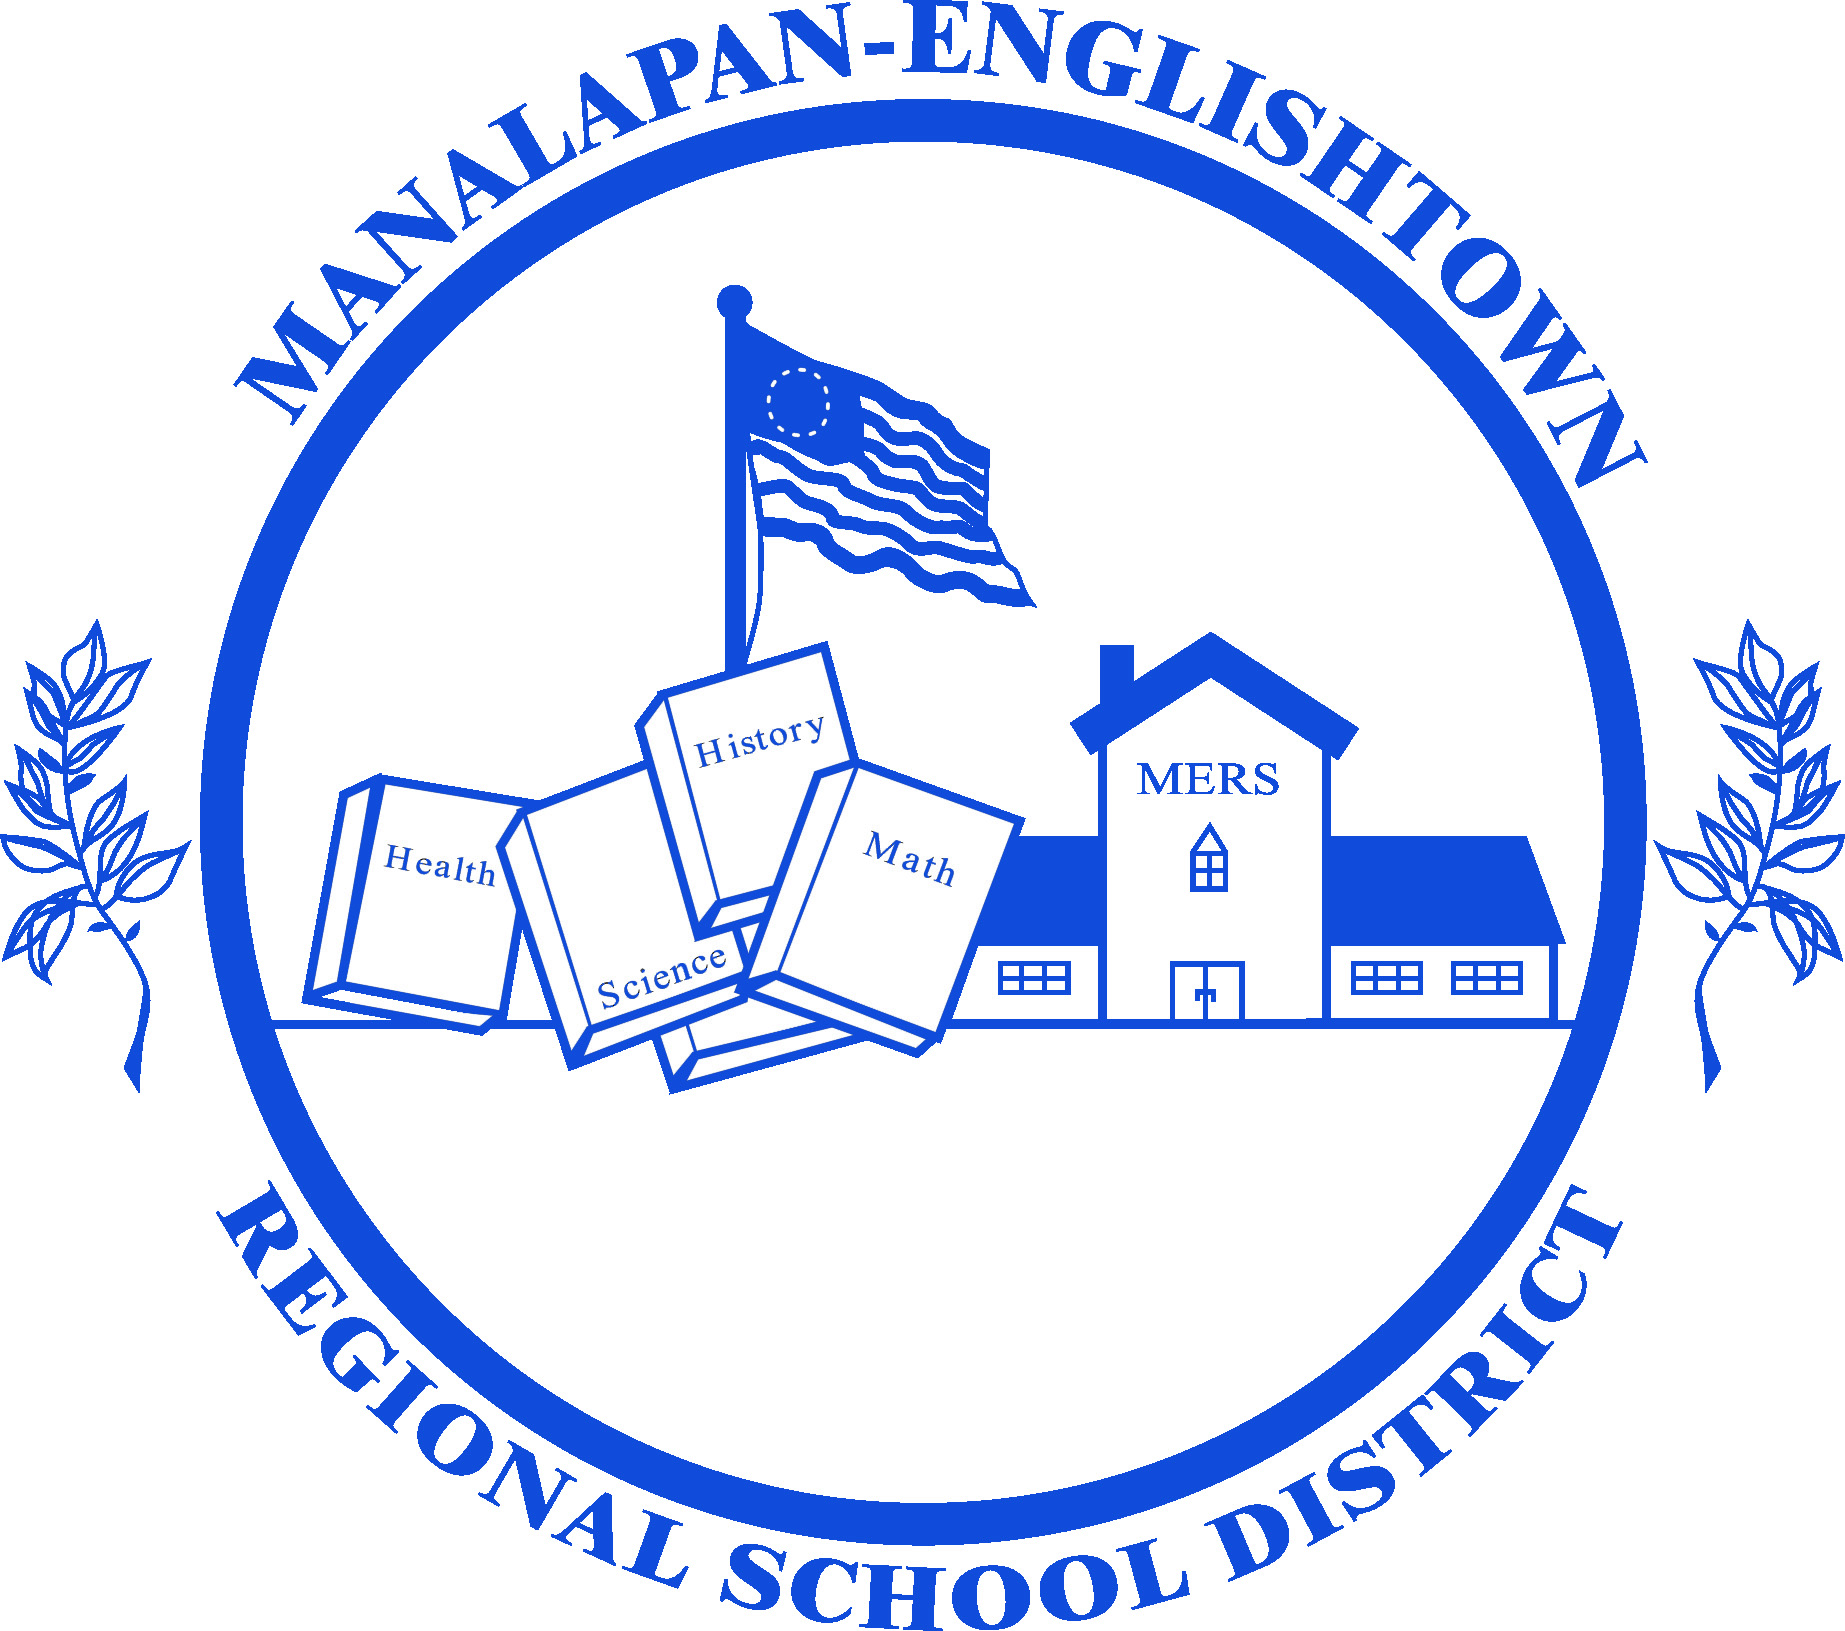 Manalapan-Englishtown Regional School District / Homepage